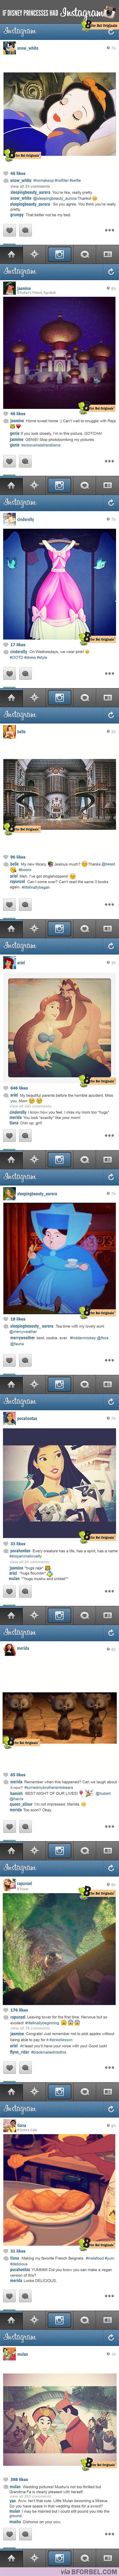 disney-princess-instagram-collage-small